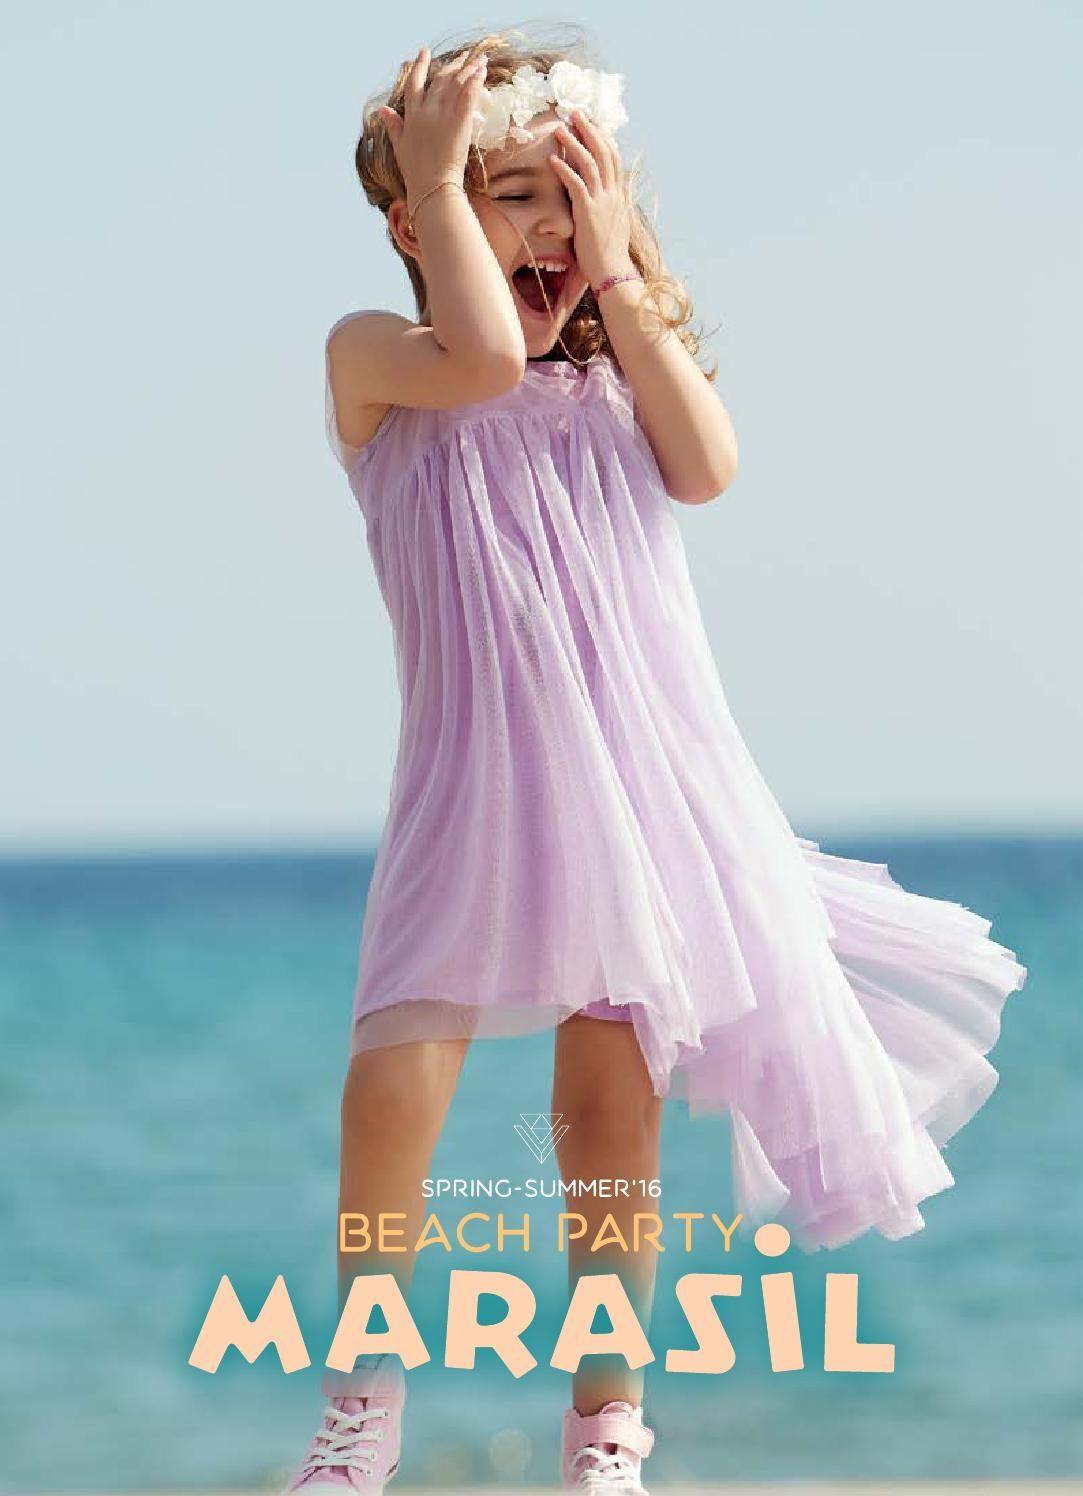 Maison Marasil. Κατάλογος - περιοδικό με παιδικά ρούχα. Δείτε στον online  κατάλογο της Μαραζίλ 95d98bc691e